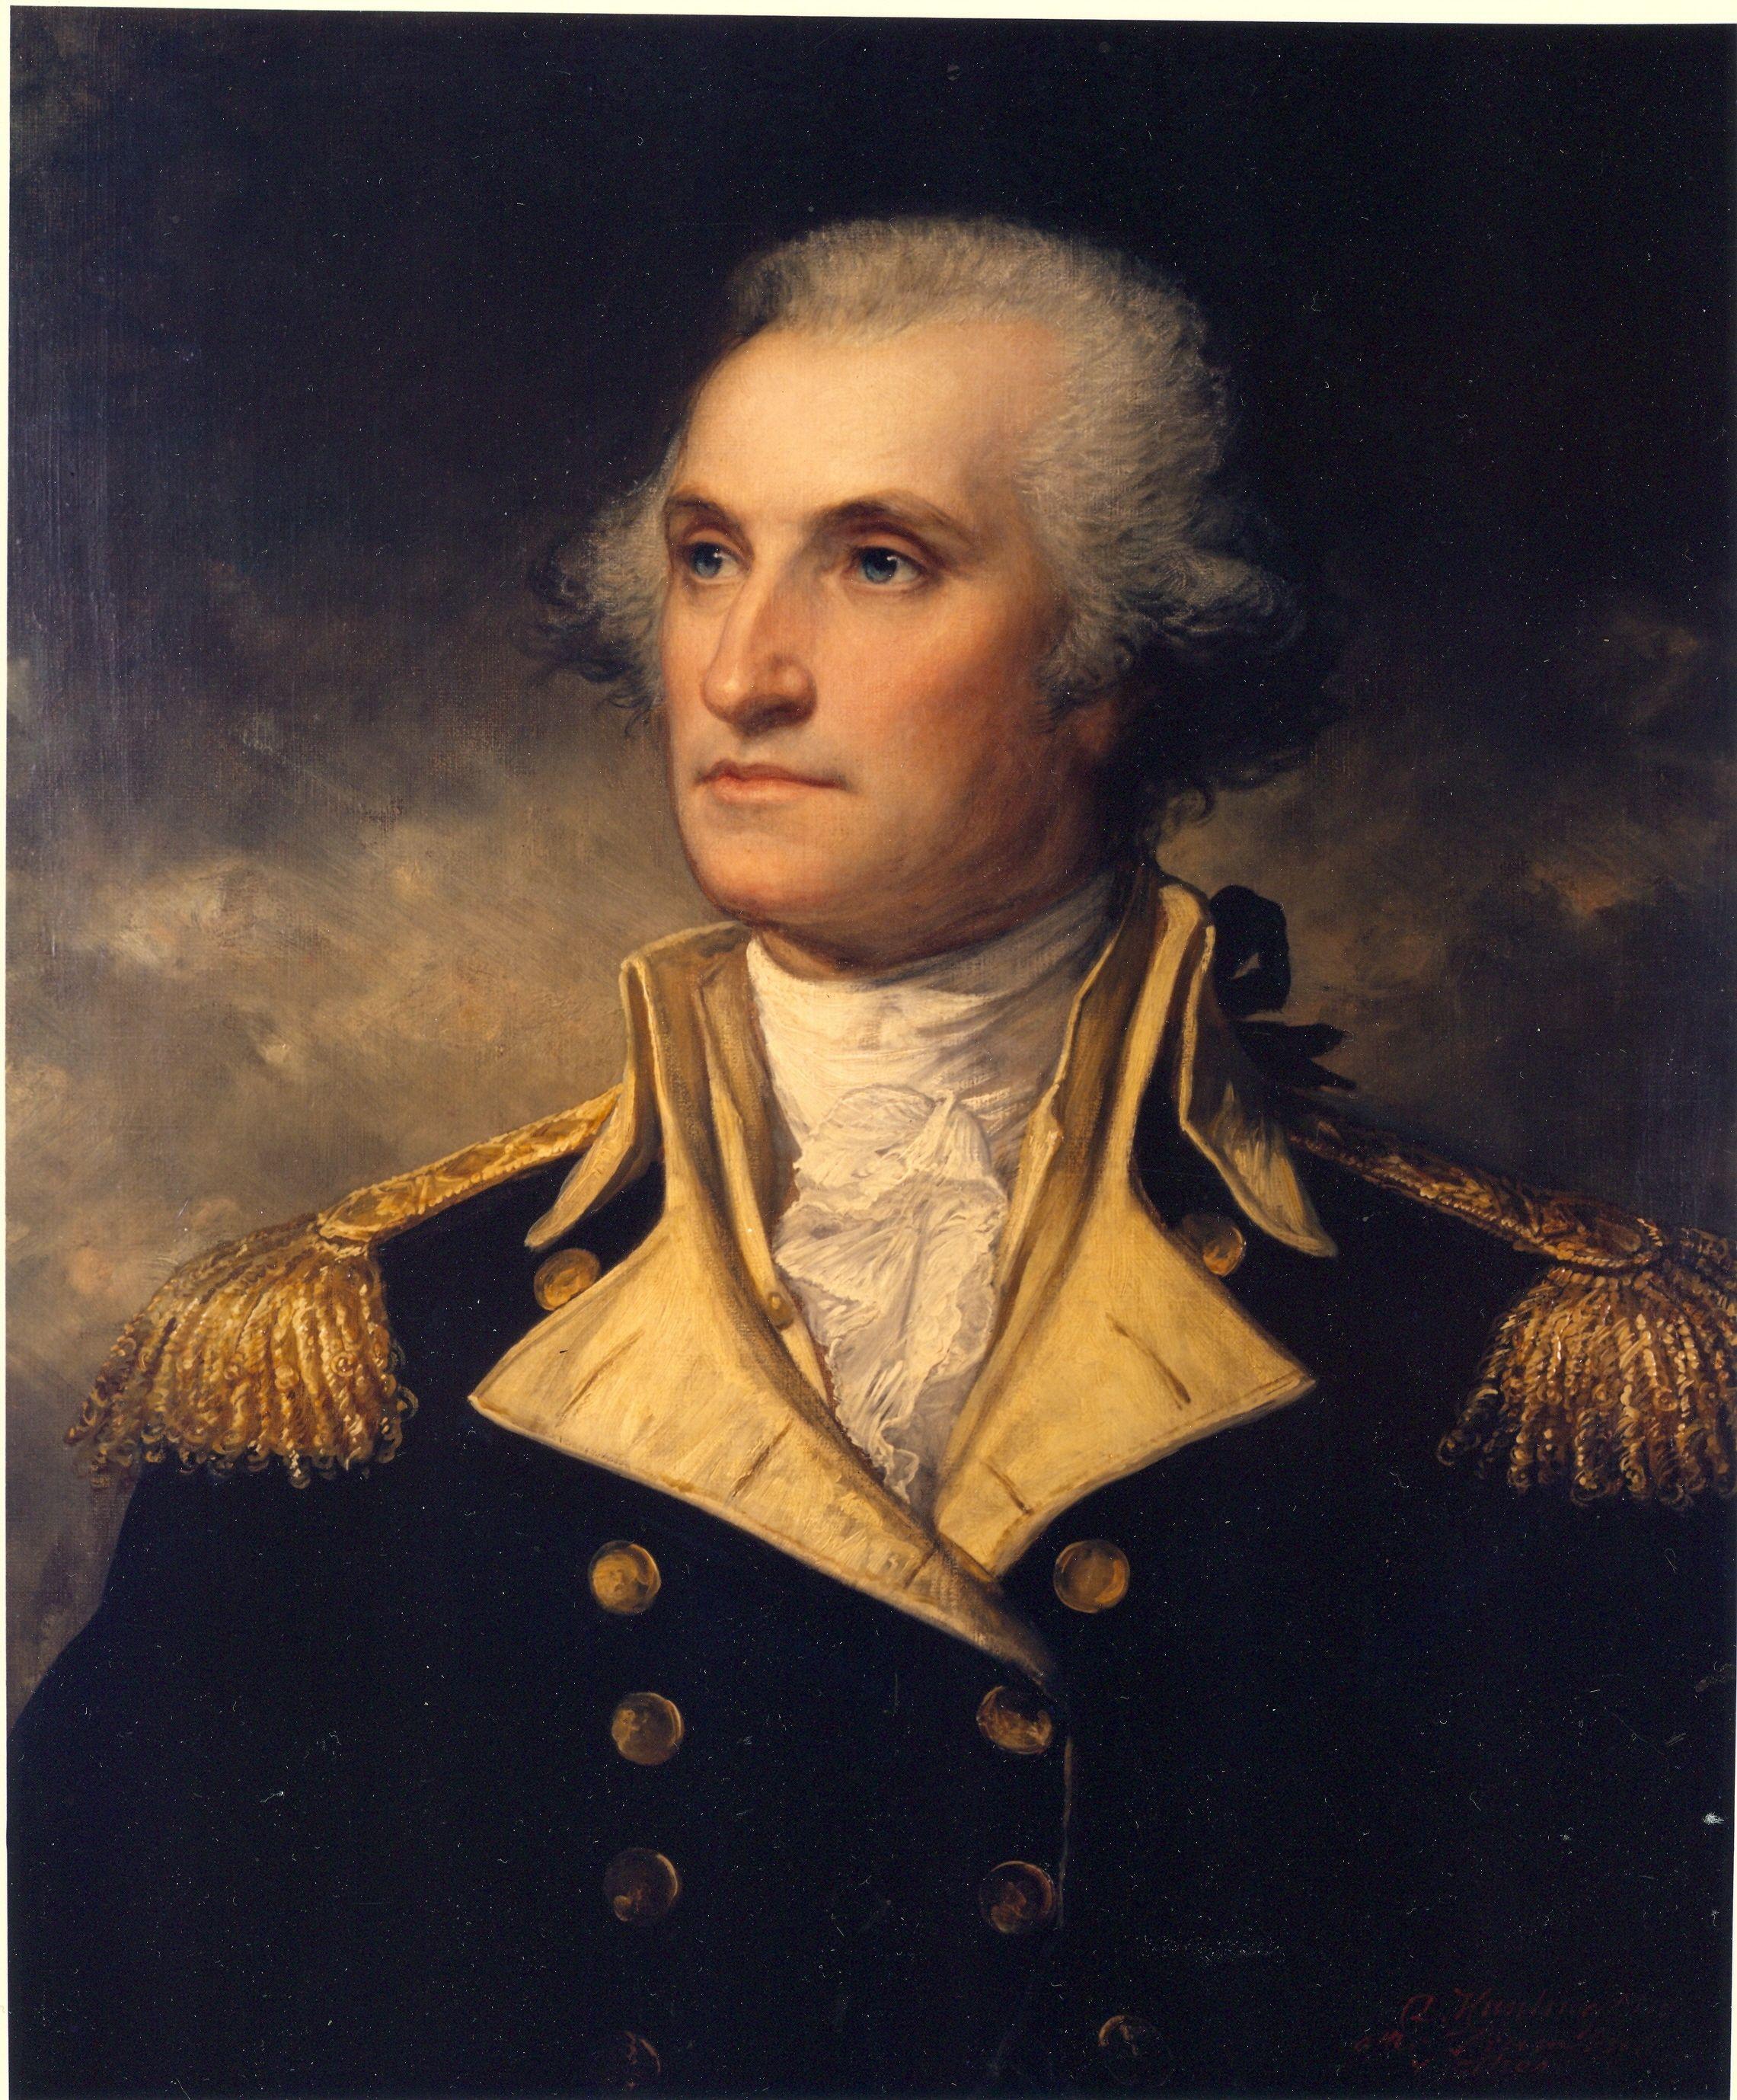 General George Washington. | George washington, George washington ...